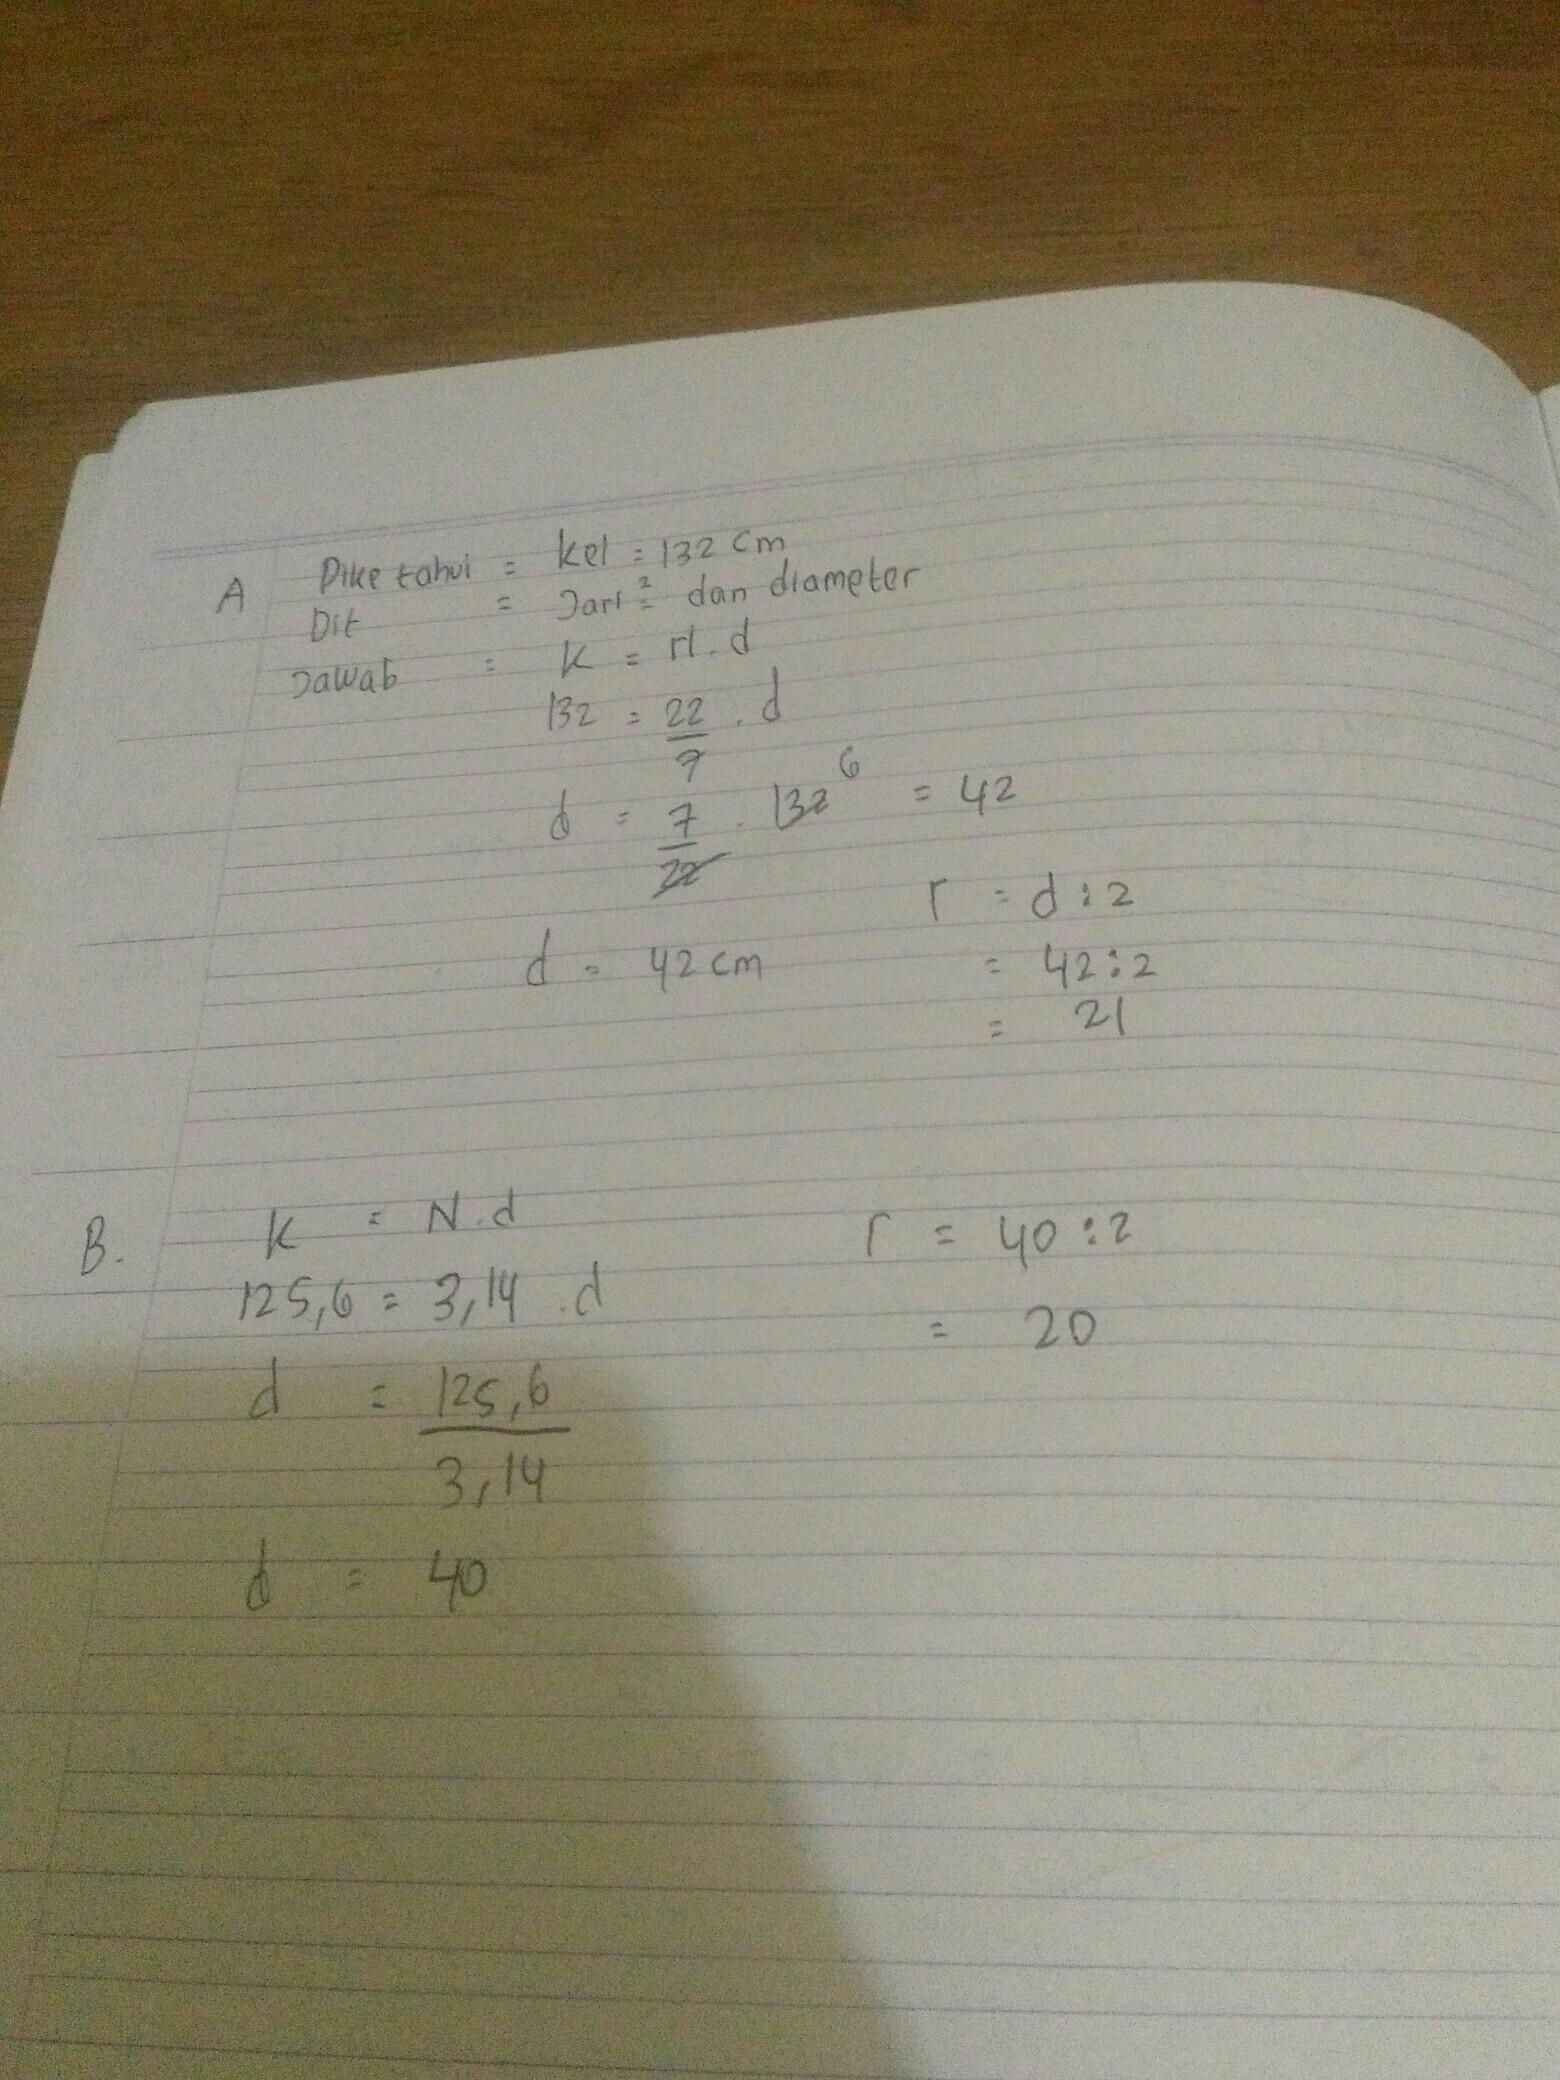 Rumus Mencari Diameter Lingkaran : rumus, mencari, diameter, lingkaran, Rumus, Mencari, Diameter, Lingkaran, Diketahui, Kelilingnya, Matematika, Dasar